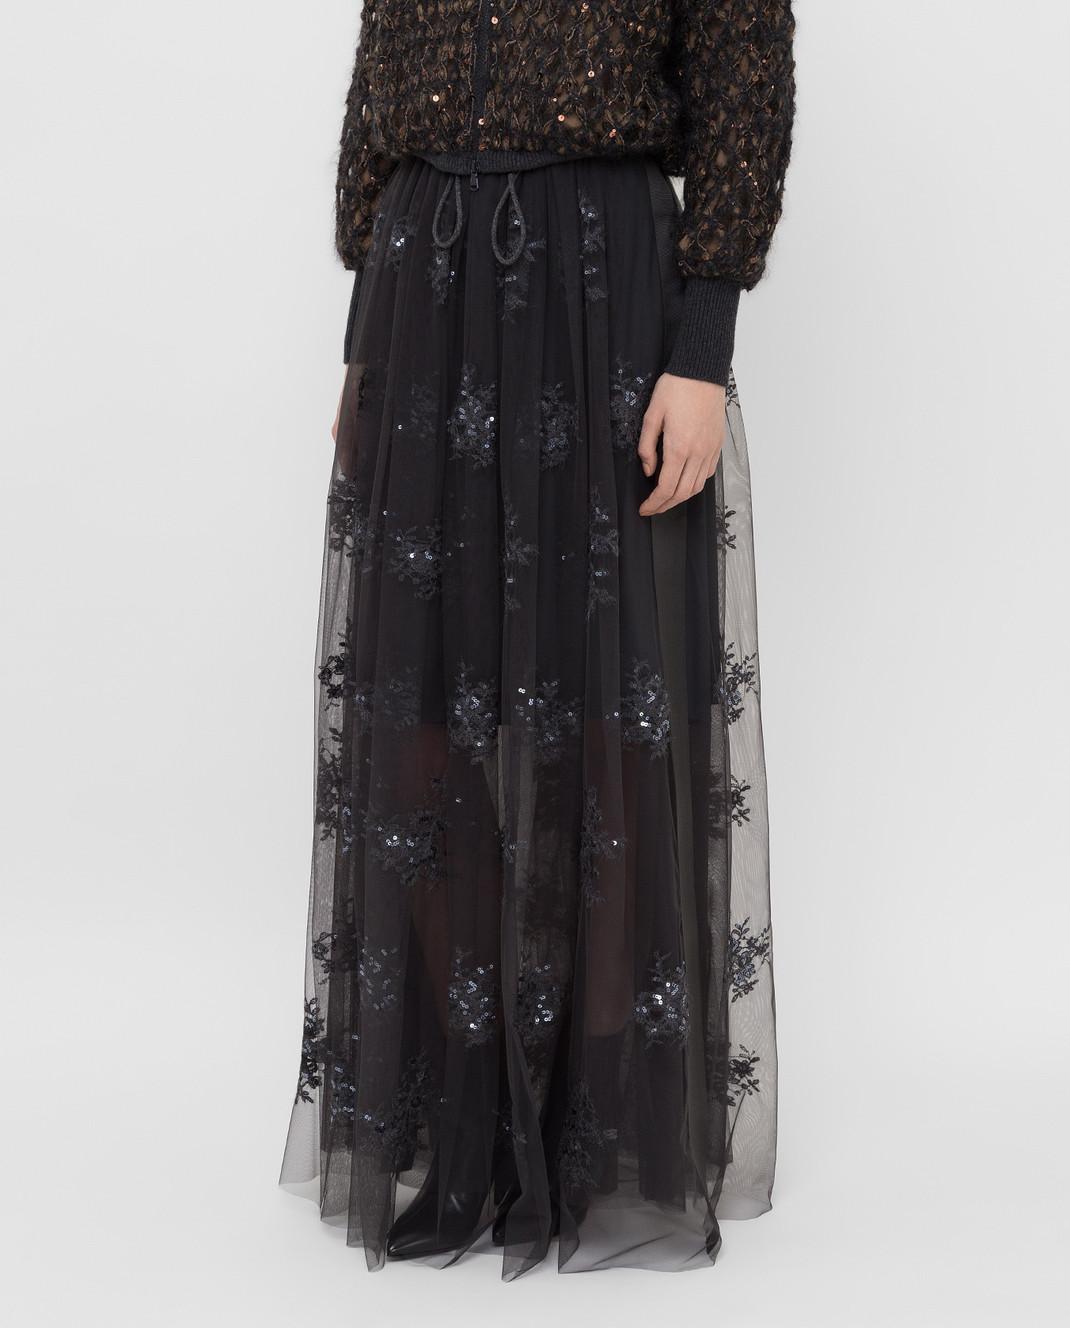 Brunello Cucinelli Темно-серая юбка MA960G2739 изображение 3